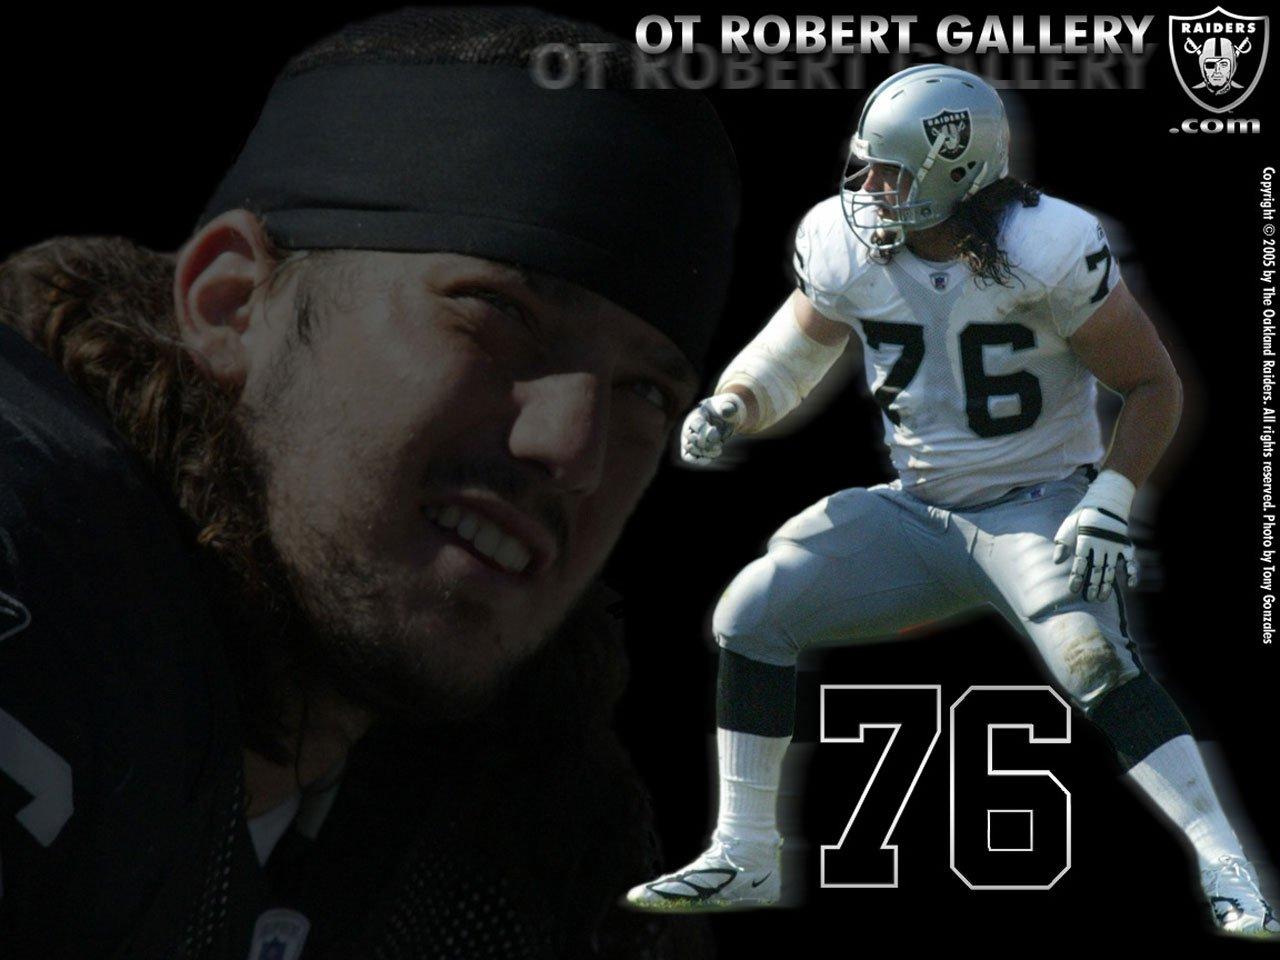 Oakland Raiders wallpaper images 1280x960